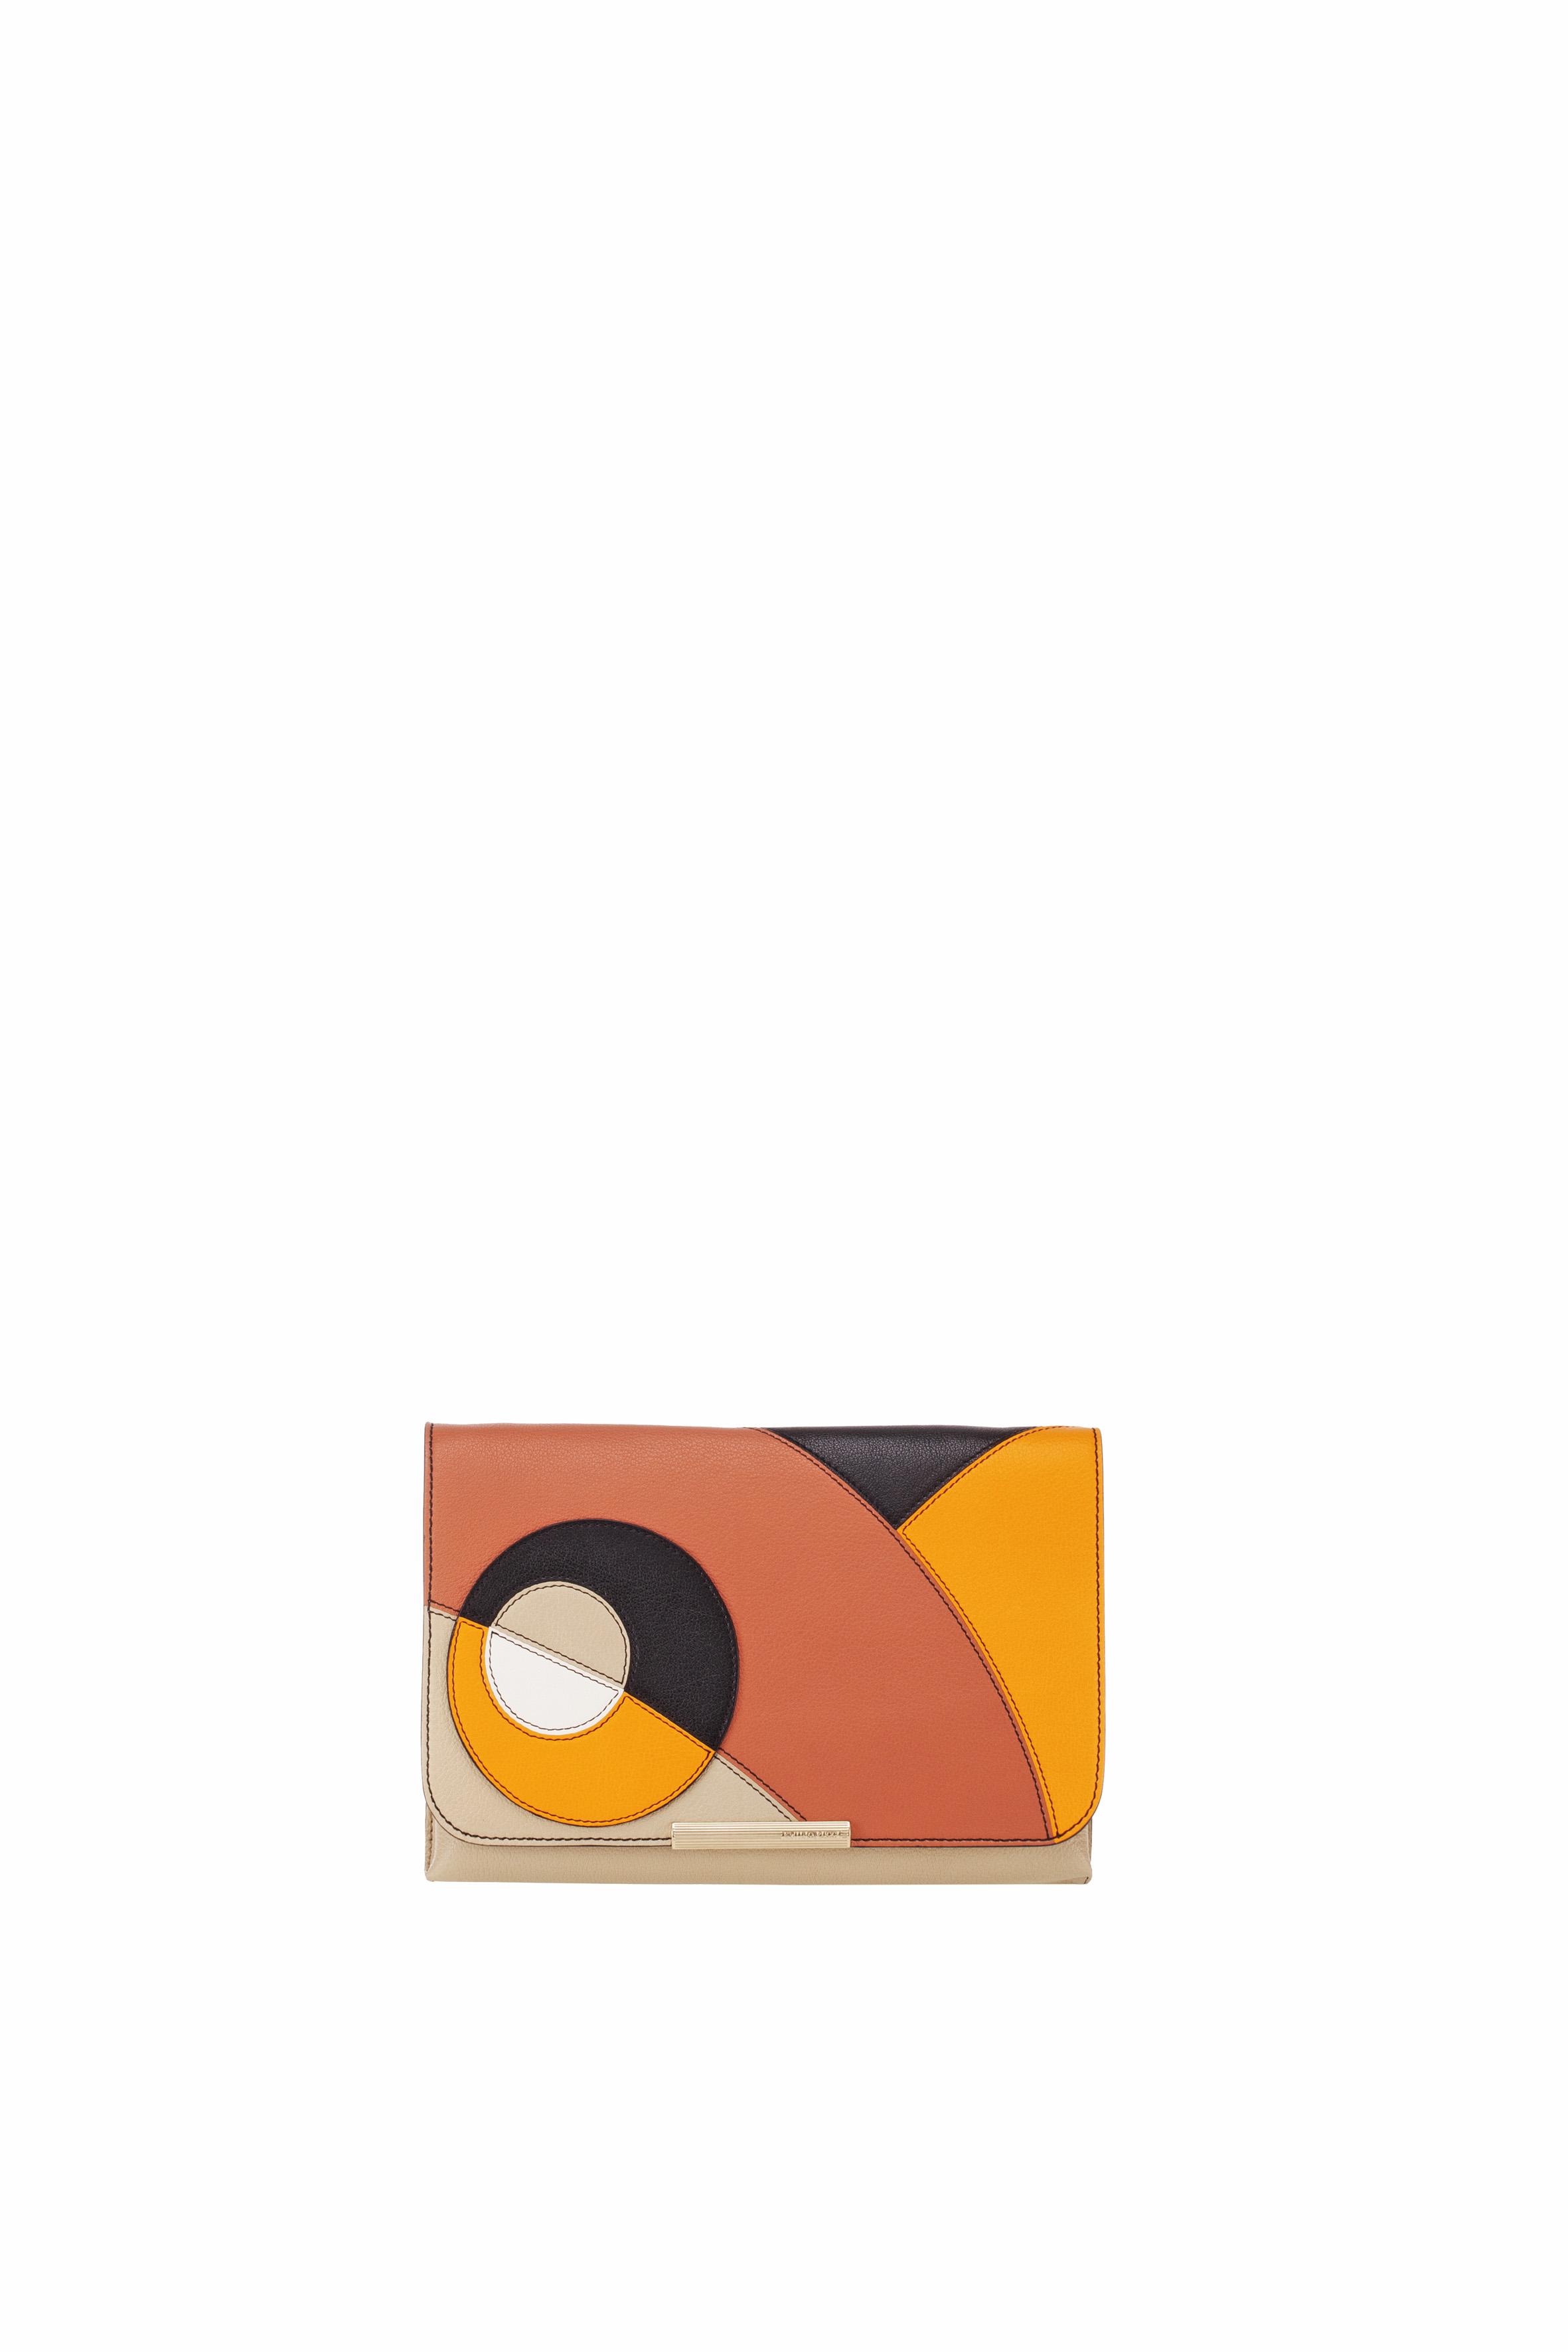 Emilio Pucci_Resort 2015 Collection_27